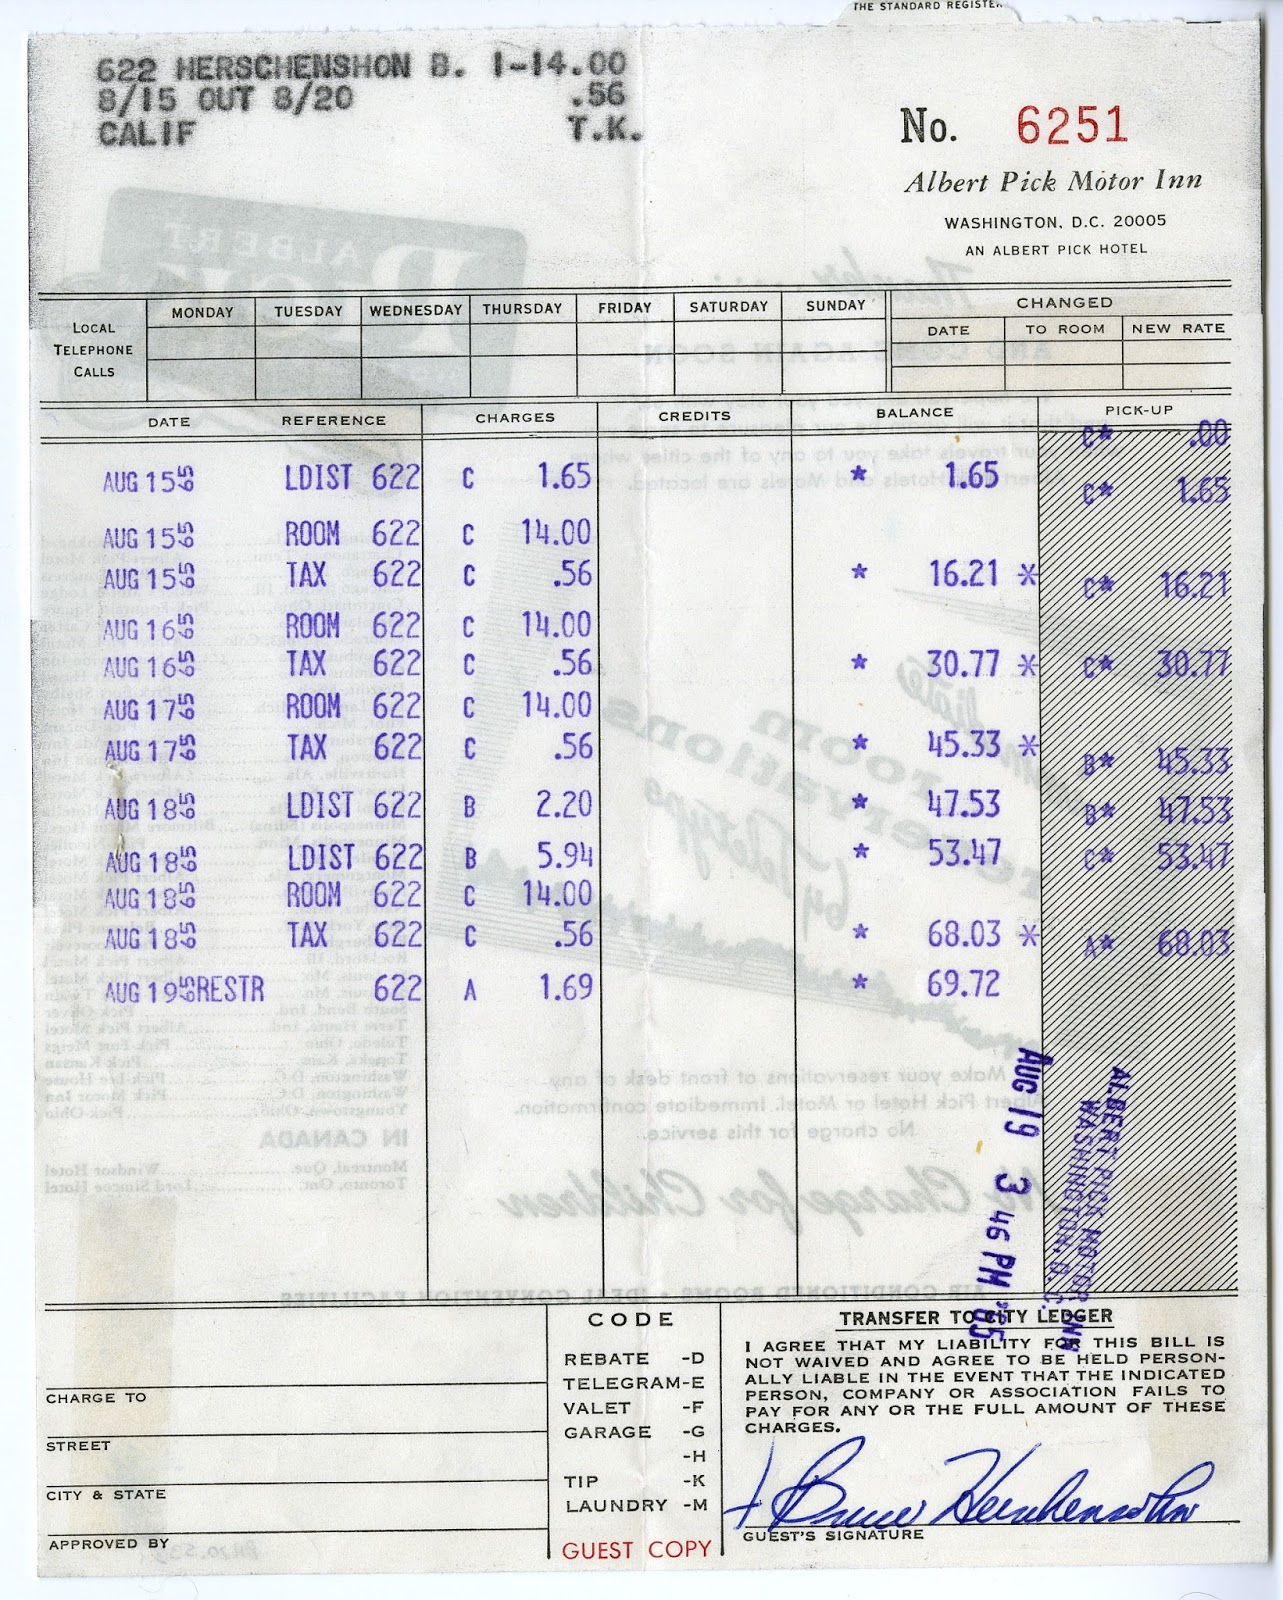 The Cardboard America Motel Archive: Albert Pick Motor Inn